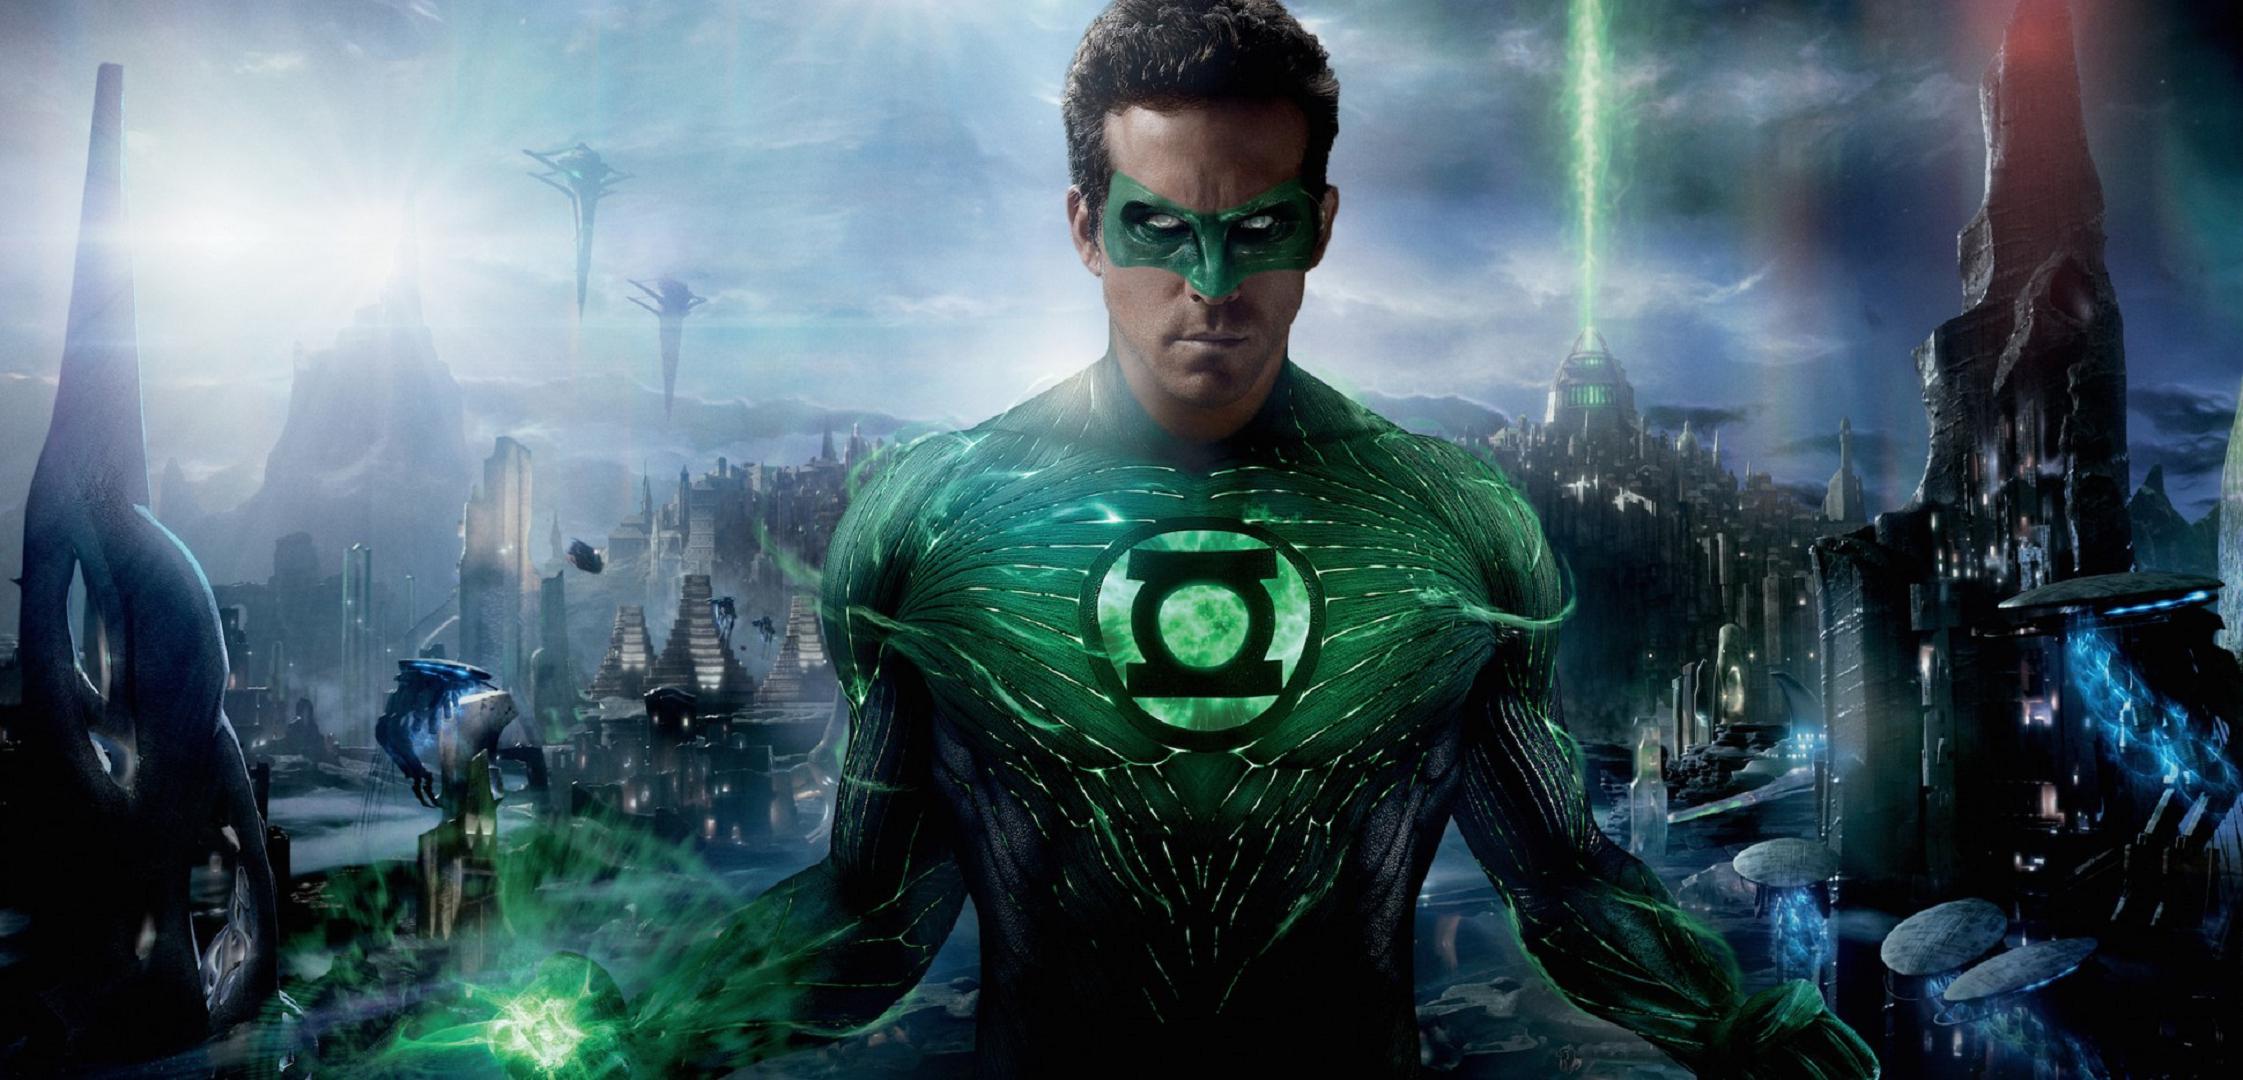 Green Lantern High Definition Wallpapers